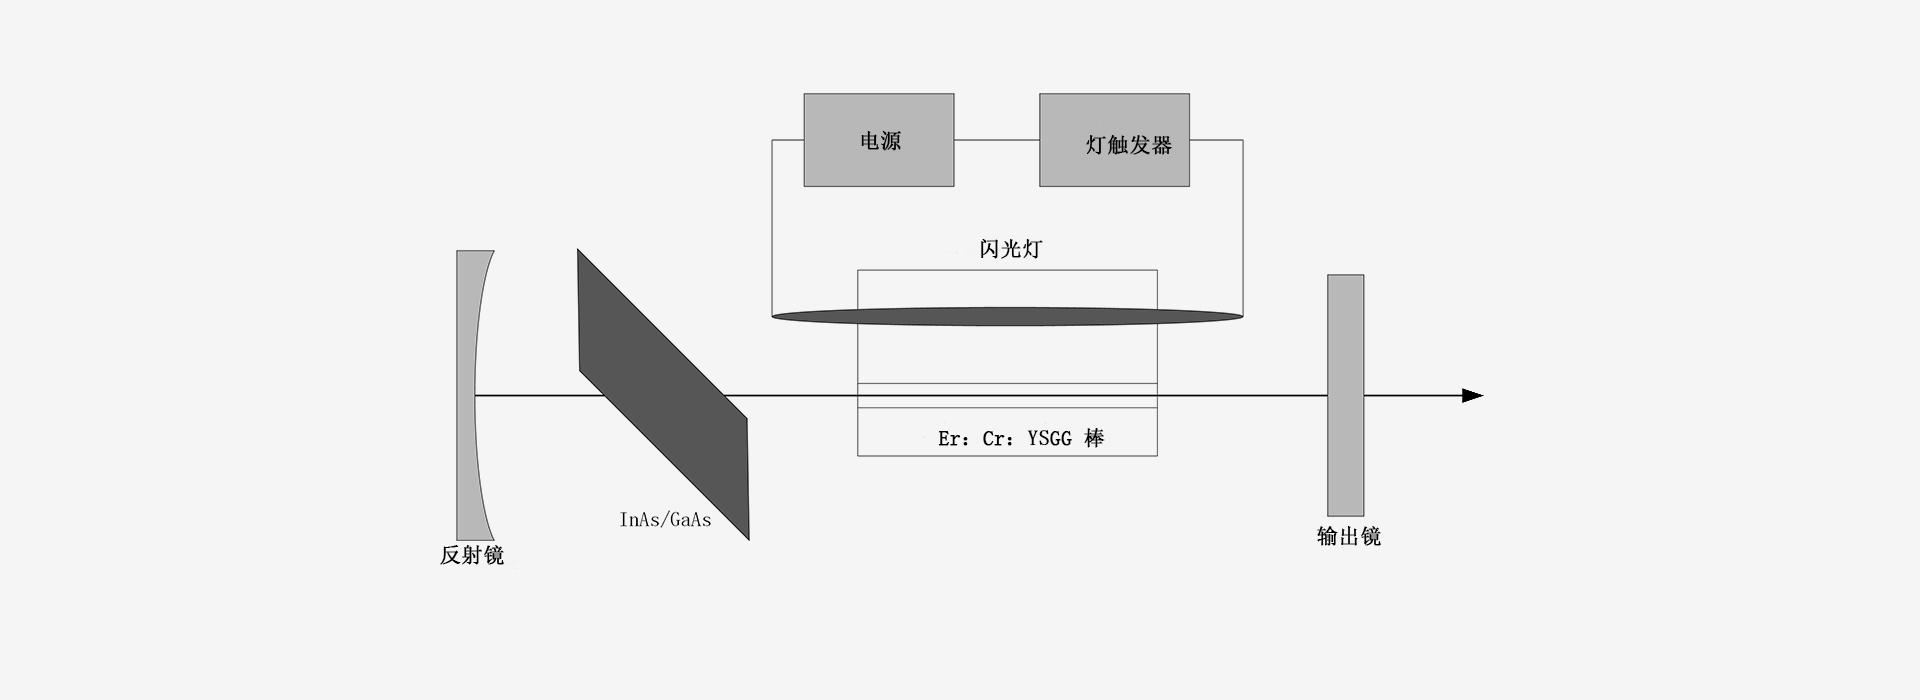 2790nm-激光器原理图-南京光宝-CRYLINK -原理图